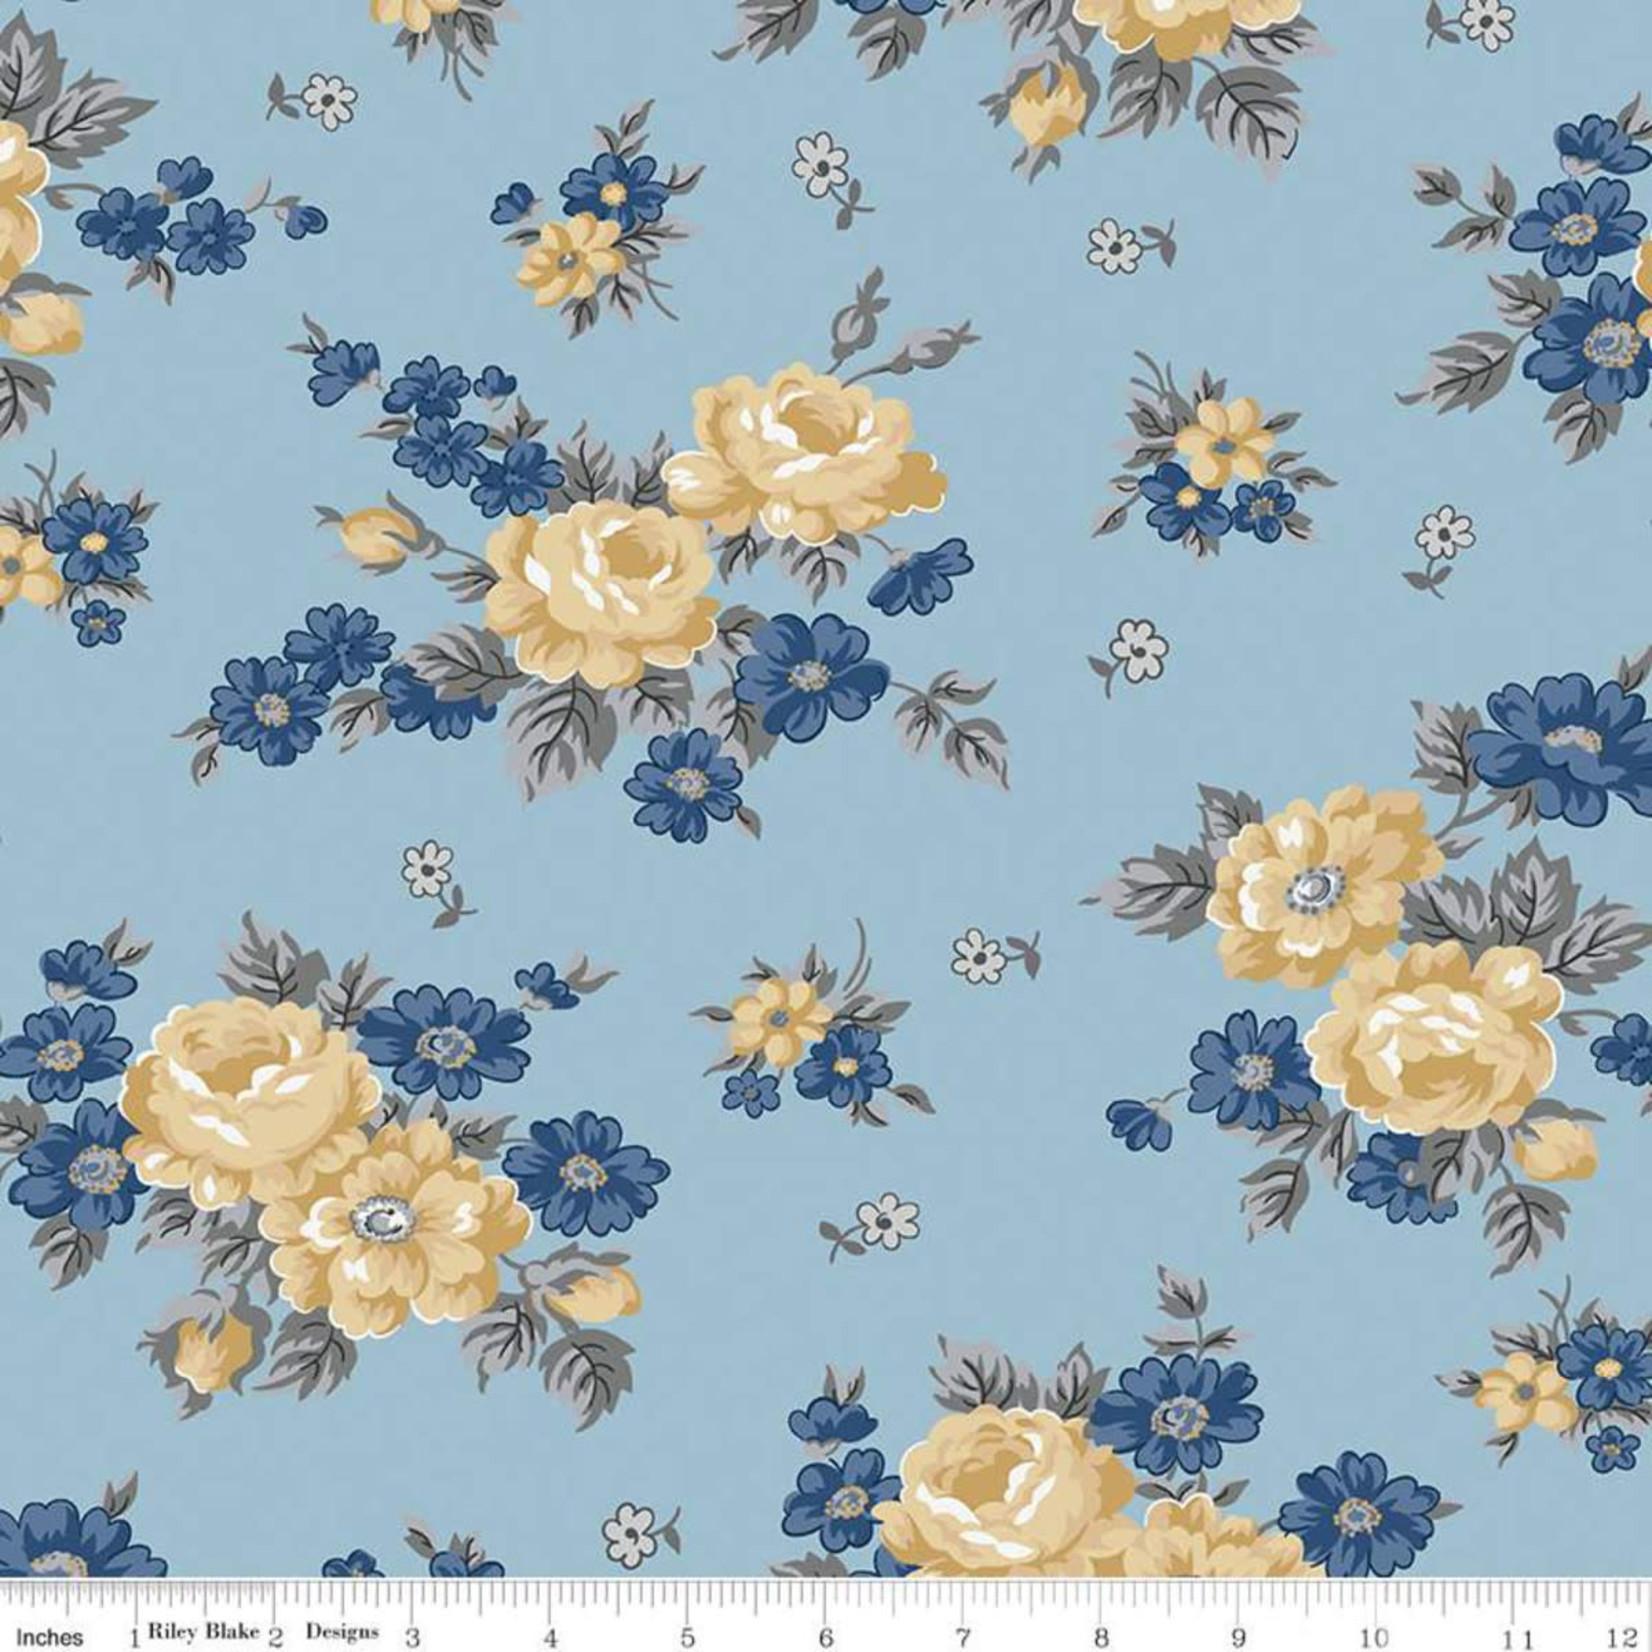 Riley Blake Designs Delightful - Main - Blue